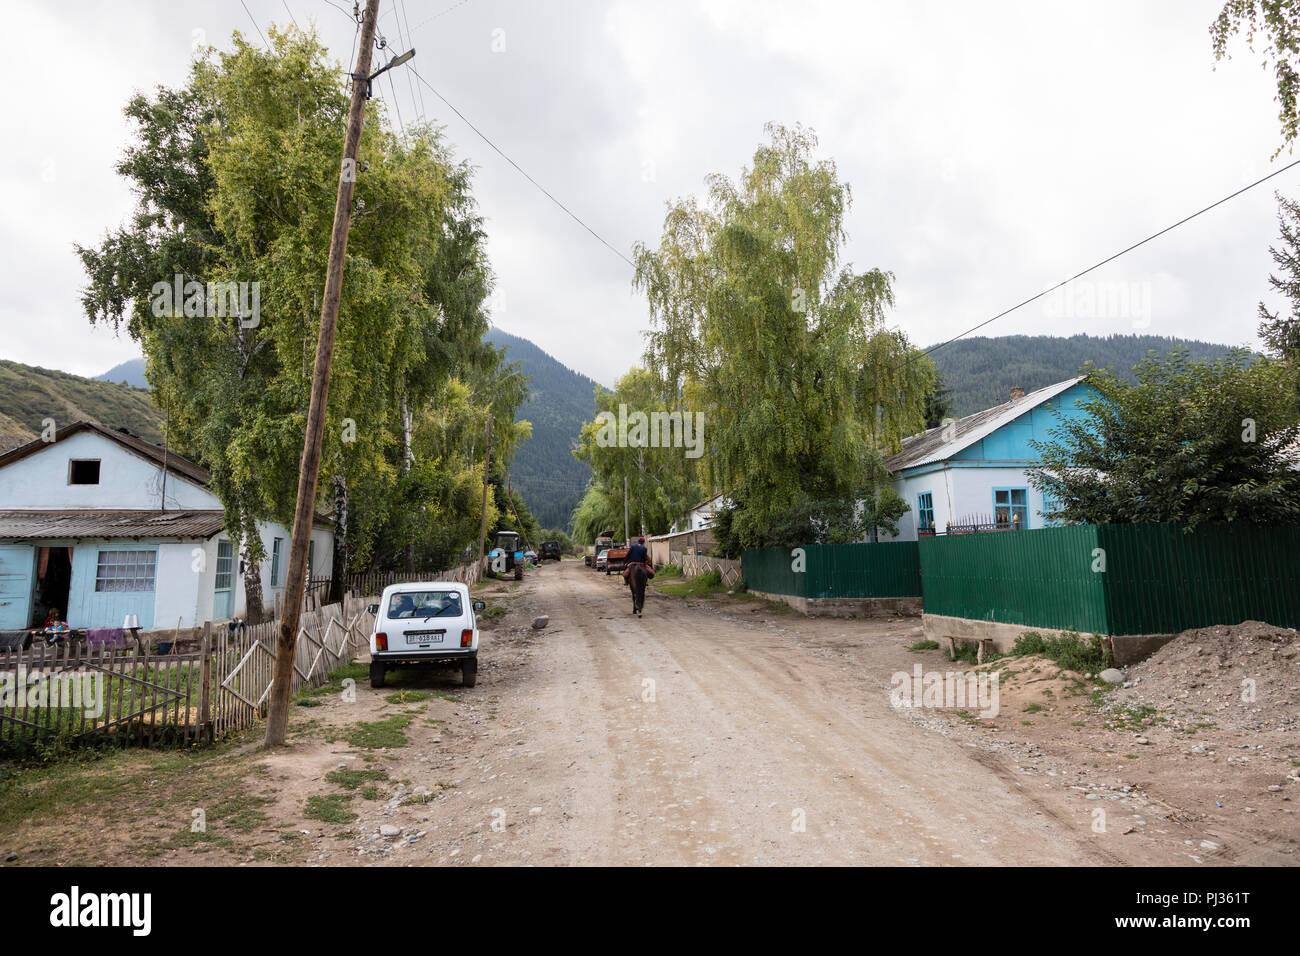 Altyn-Arashan, Kyrgyzstan, August 13 2018: Horse trek in the valley of Alty-Arashan near Karakol - Stock Image